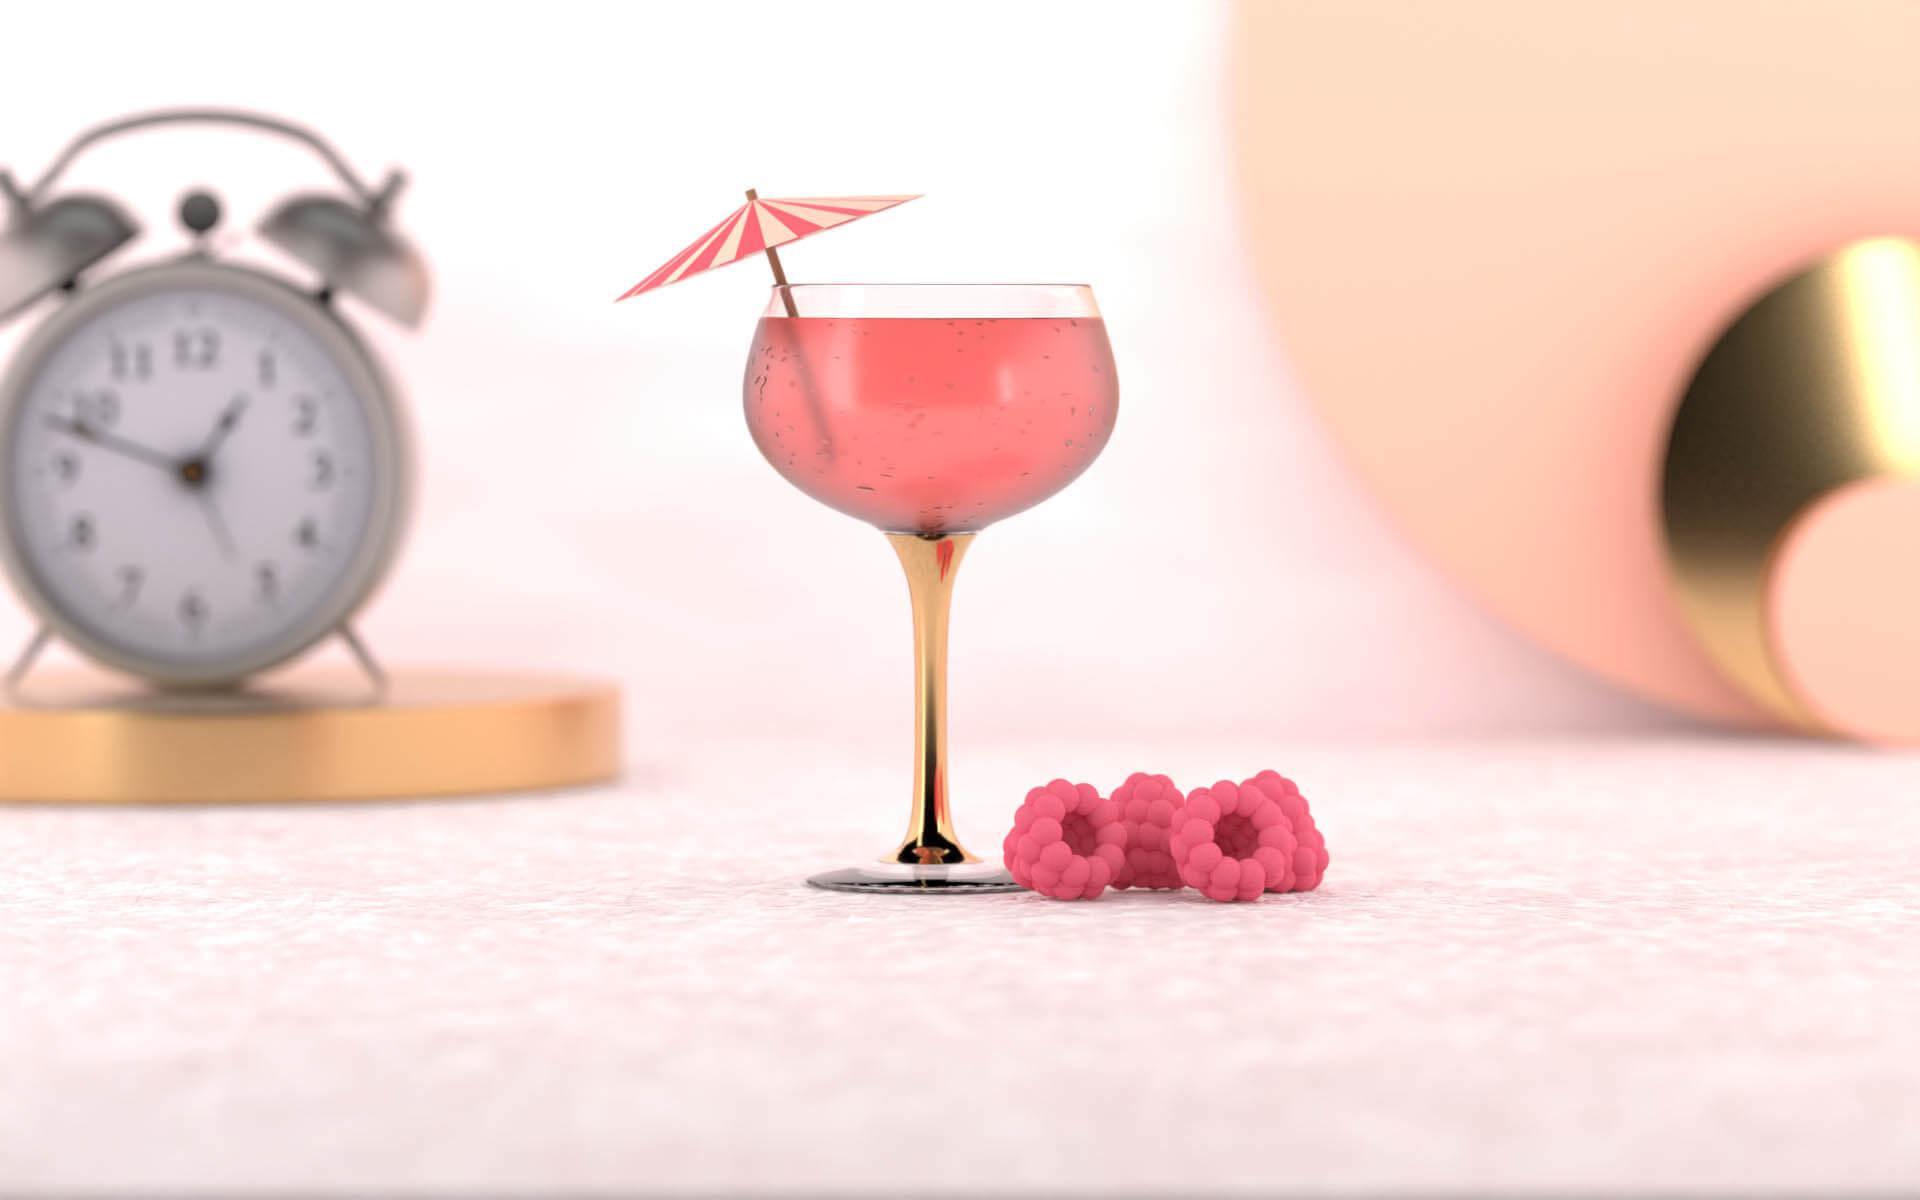 poseidn-3ddrink-3dfood-summercollection-raspberry-1